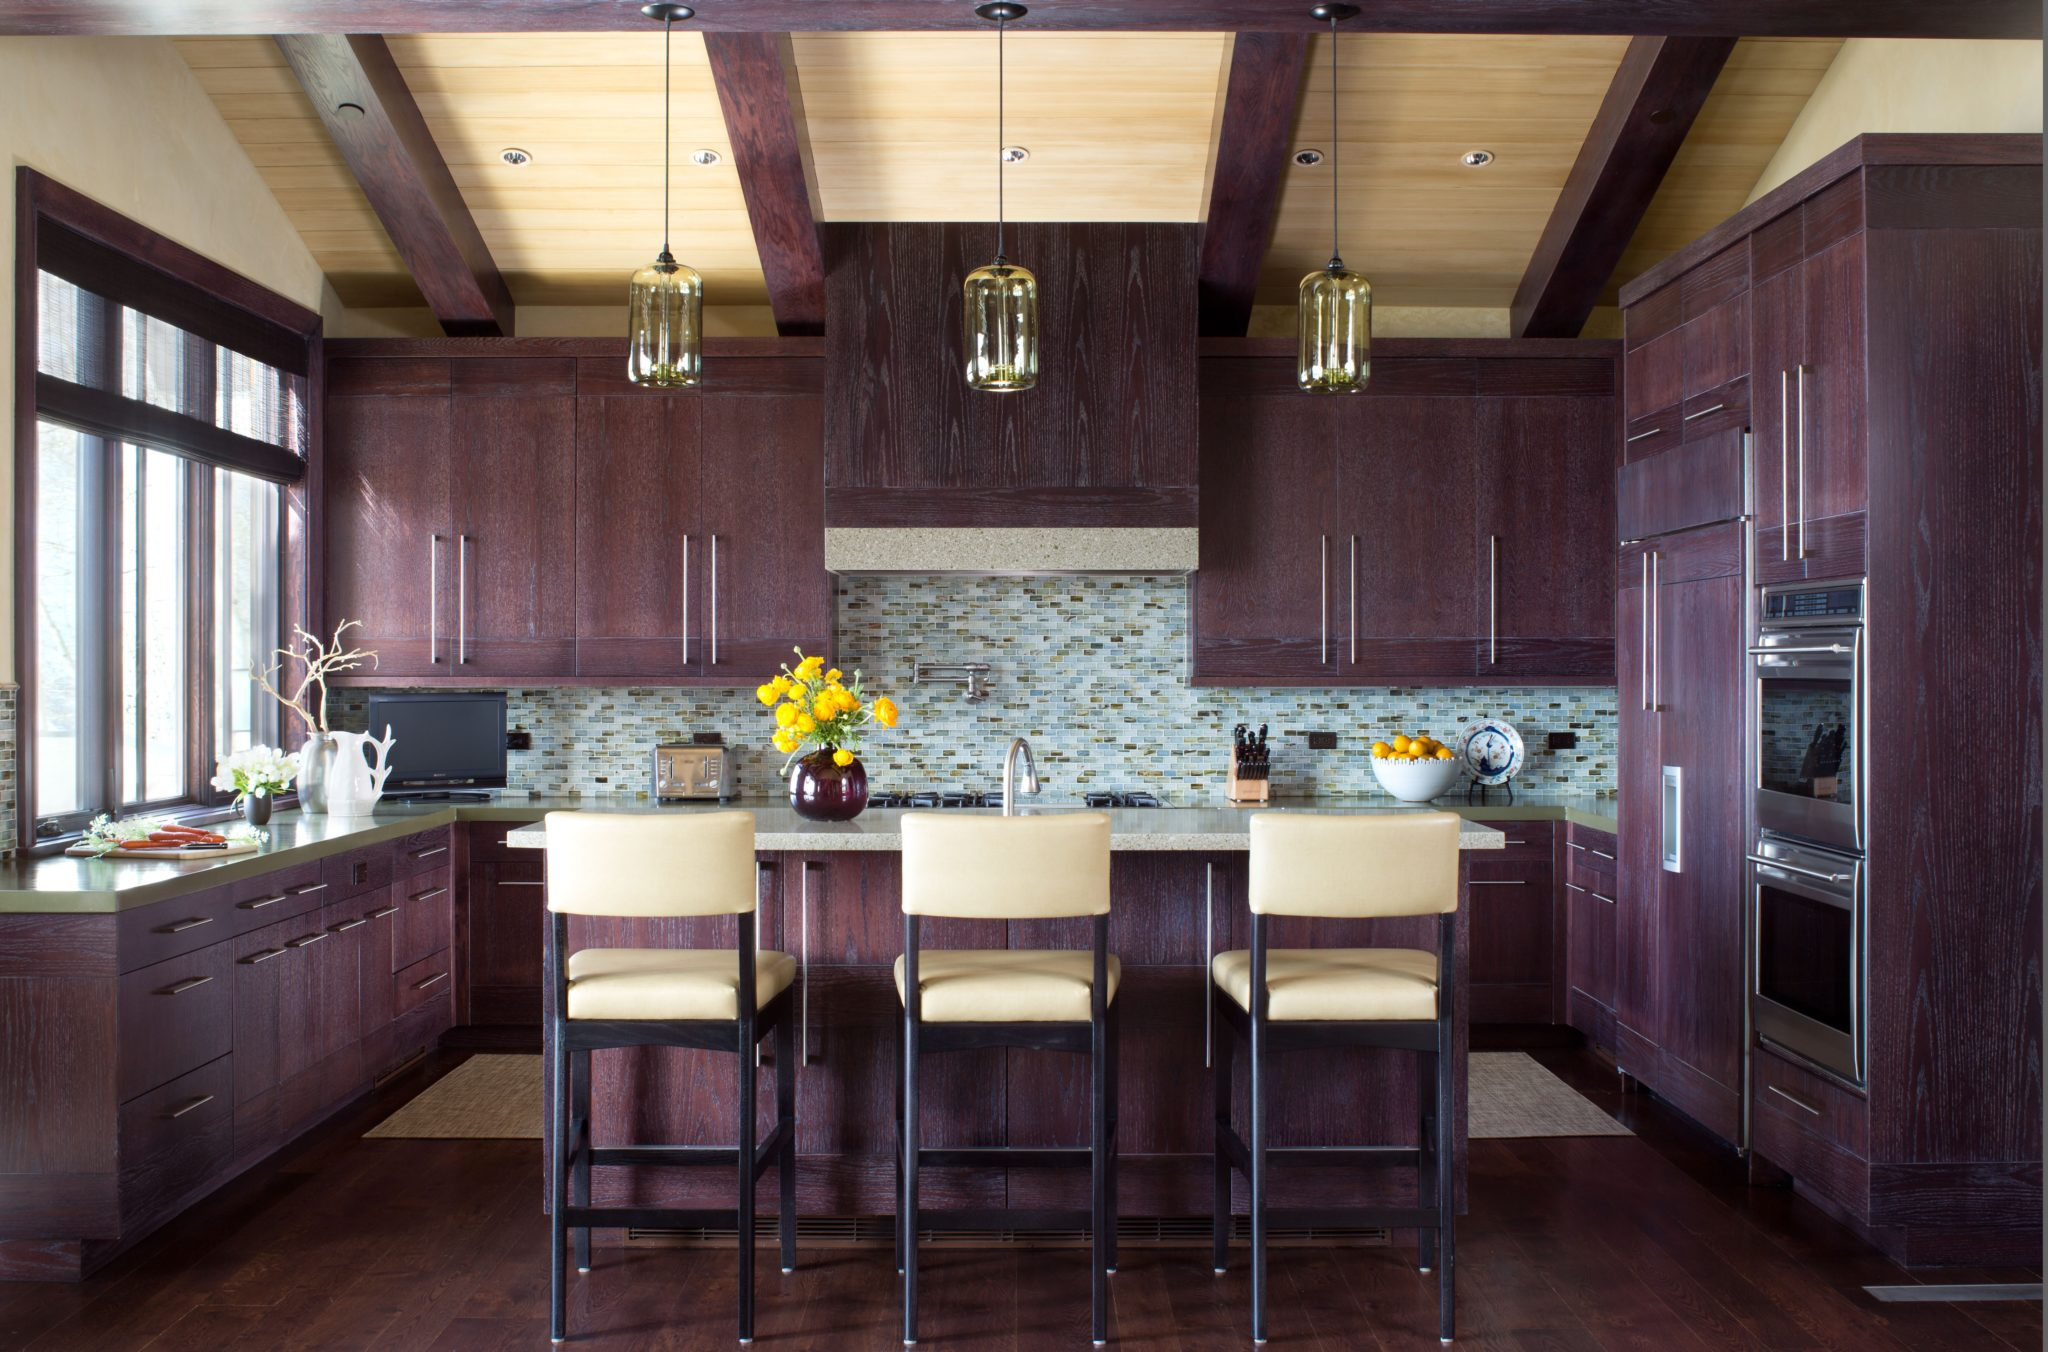 Interior design by Worth Interiors